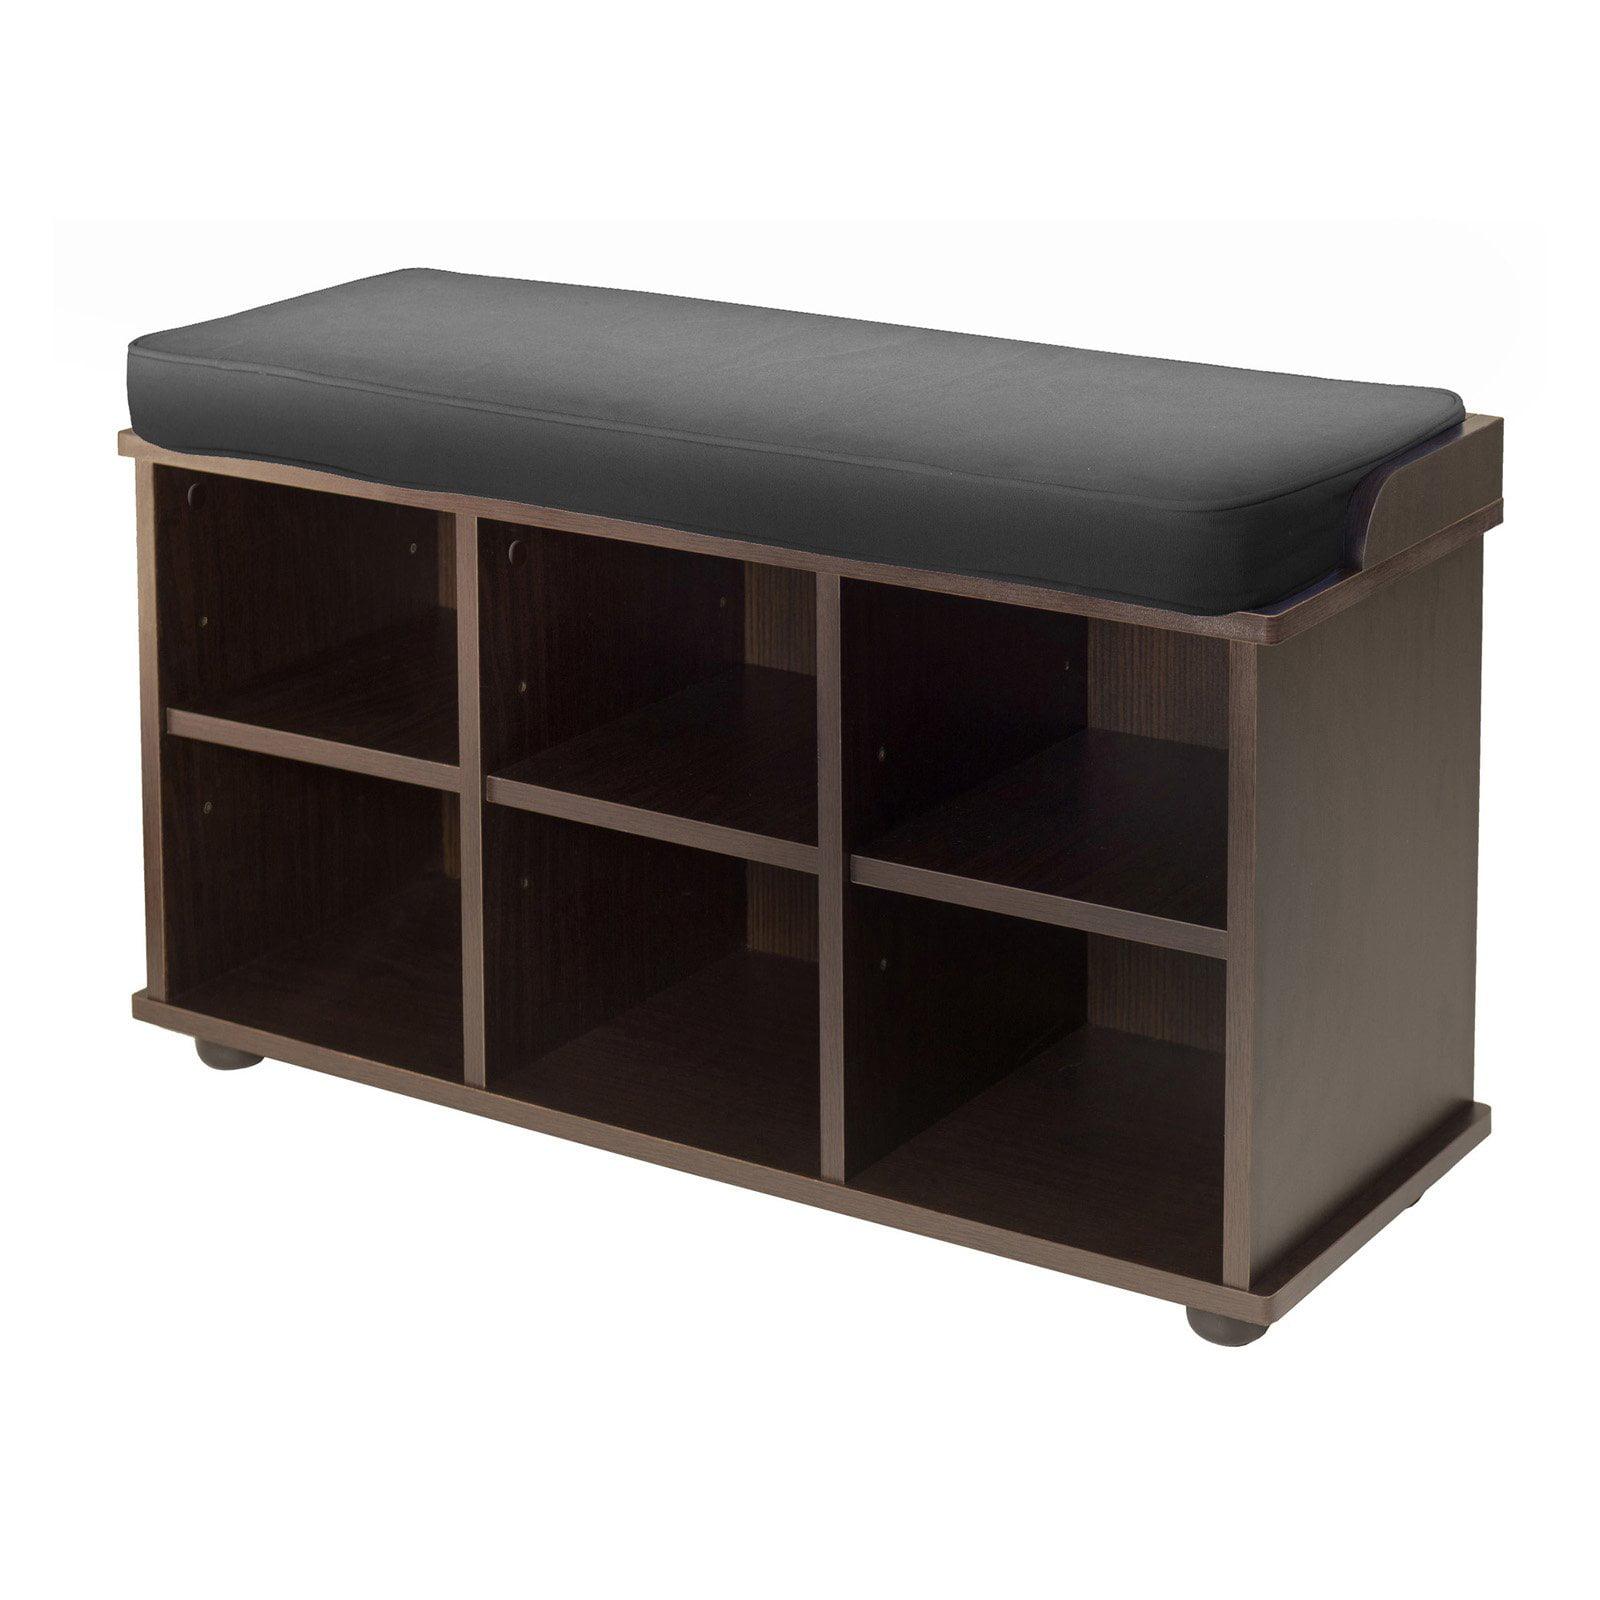 Winsome Wood Townsend Storage Bench Seat Cushion Black Espresso Walmart Com Walmart Com